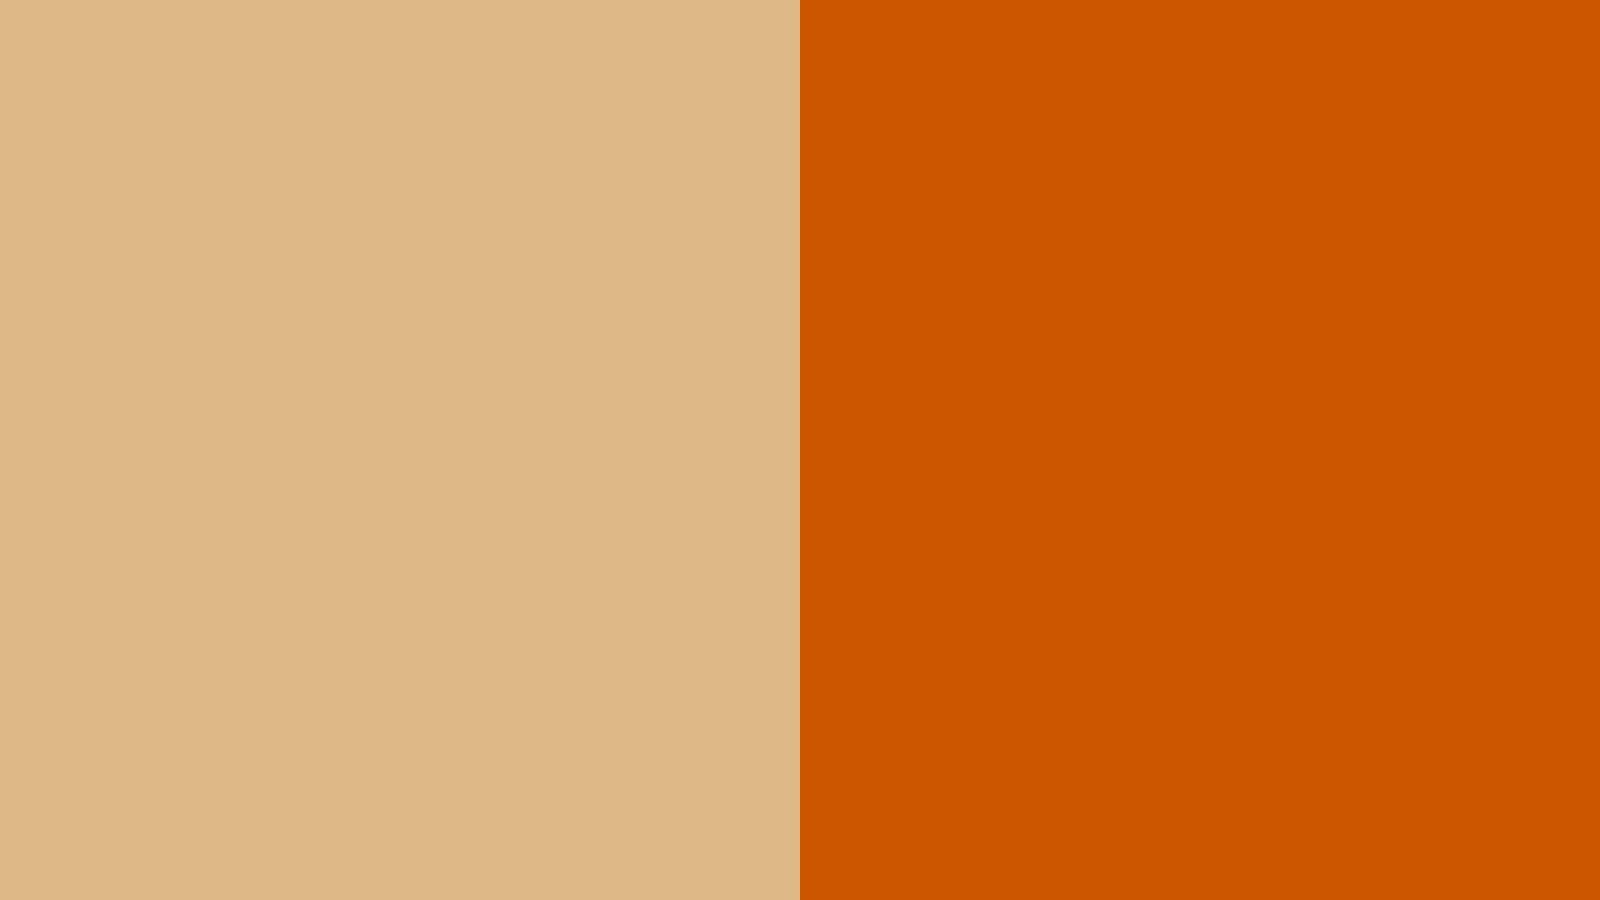 orange color wallpaper images